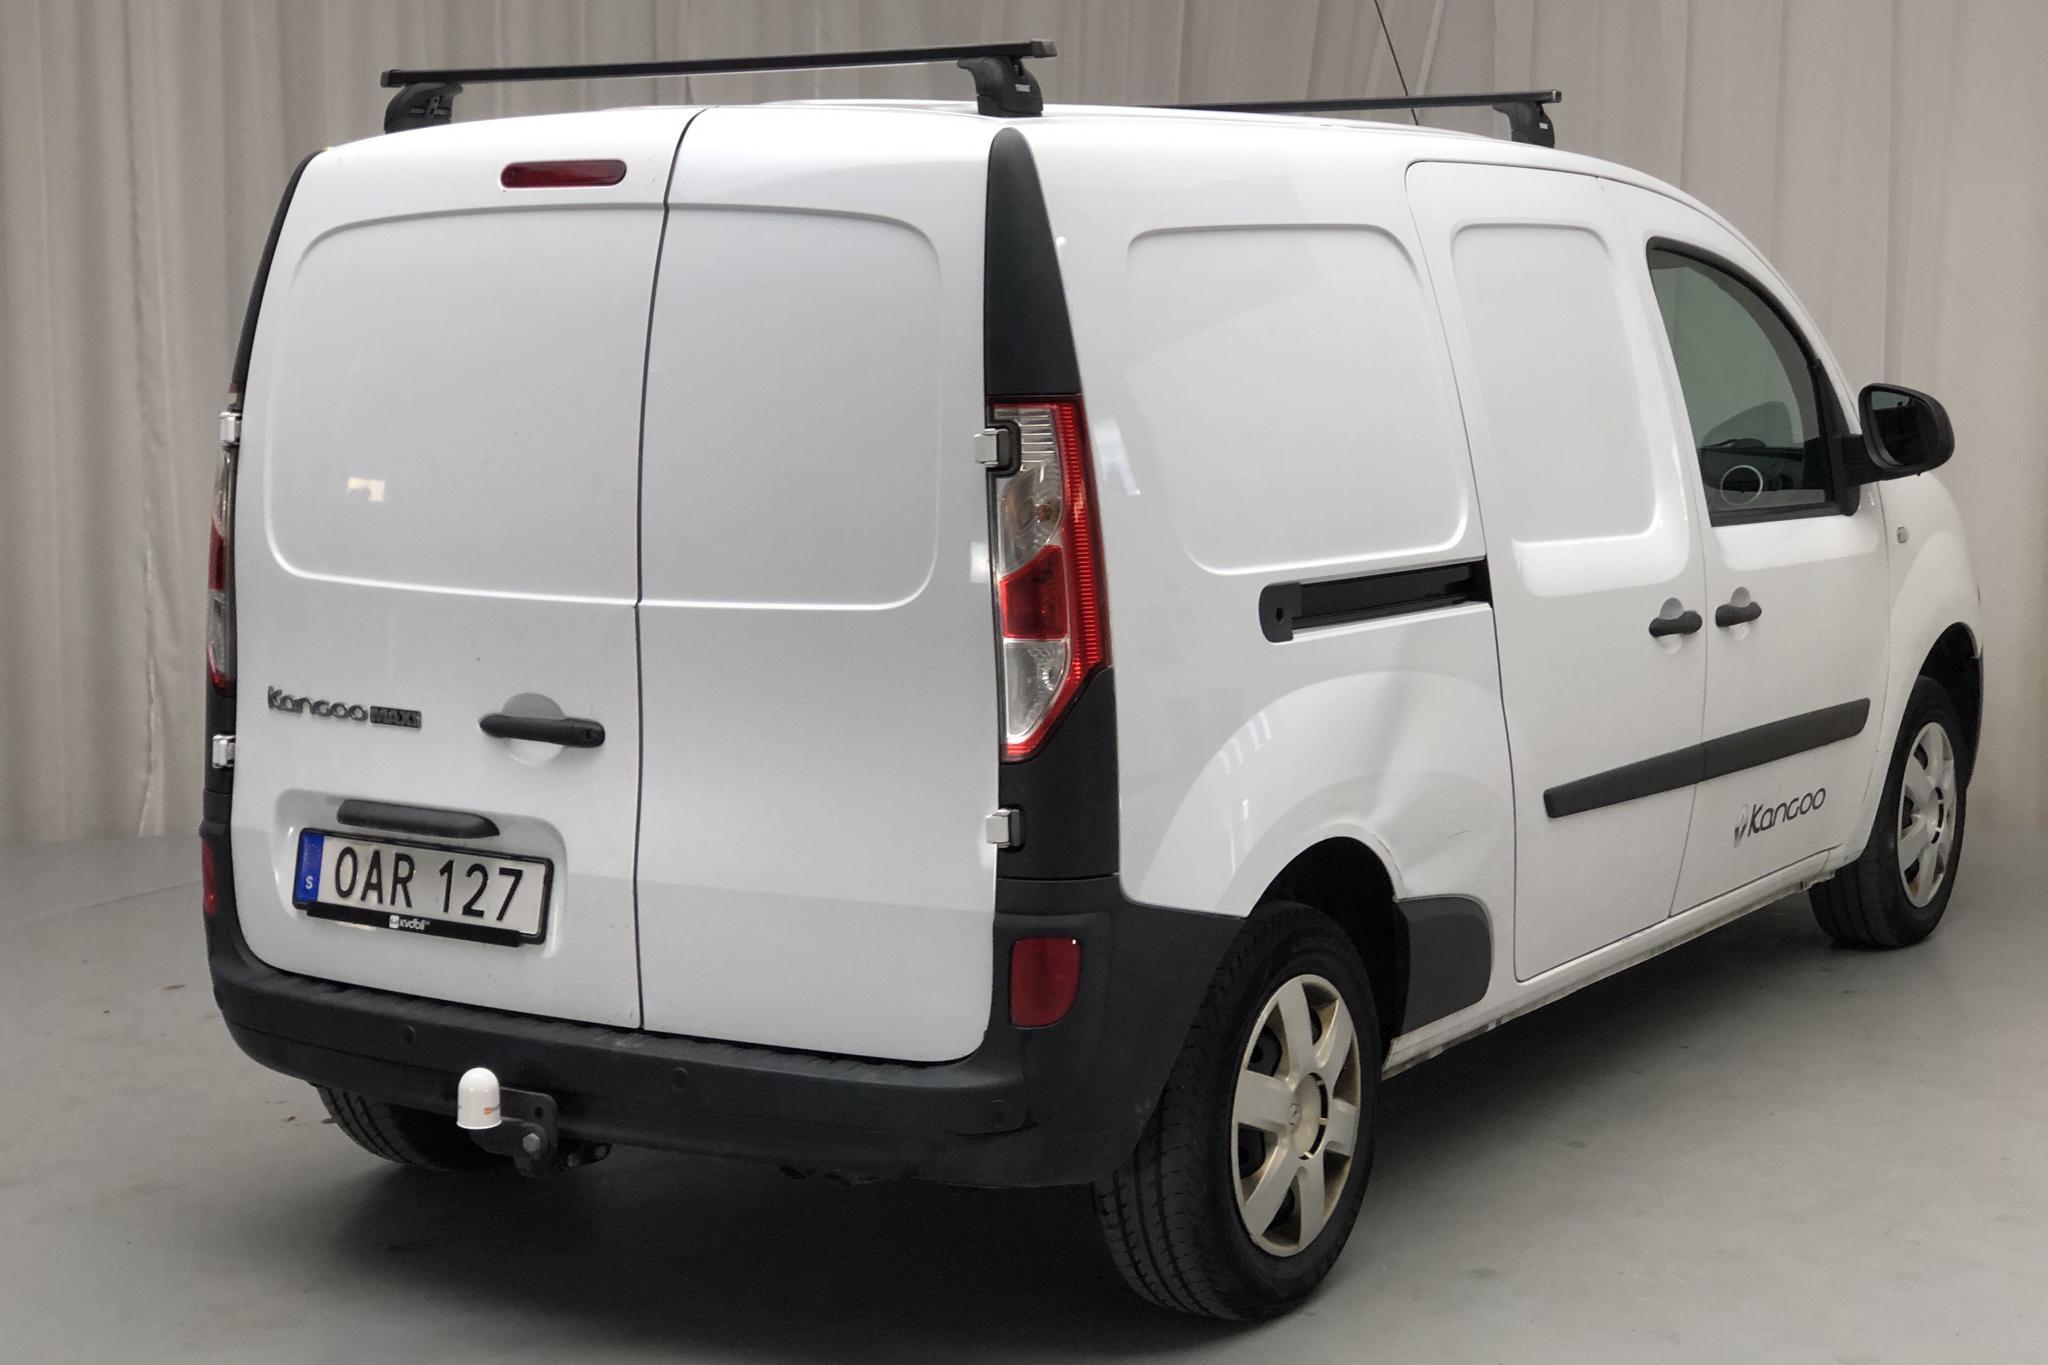 Renault Kangoo 1.5 dCi Maxi Skåp (110hk) - 6 012 mil - Manuell - vit - 2016